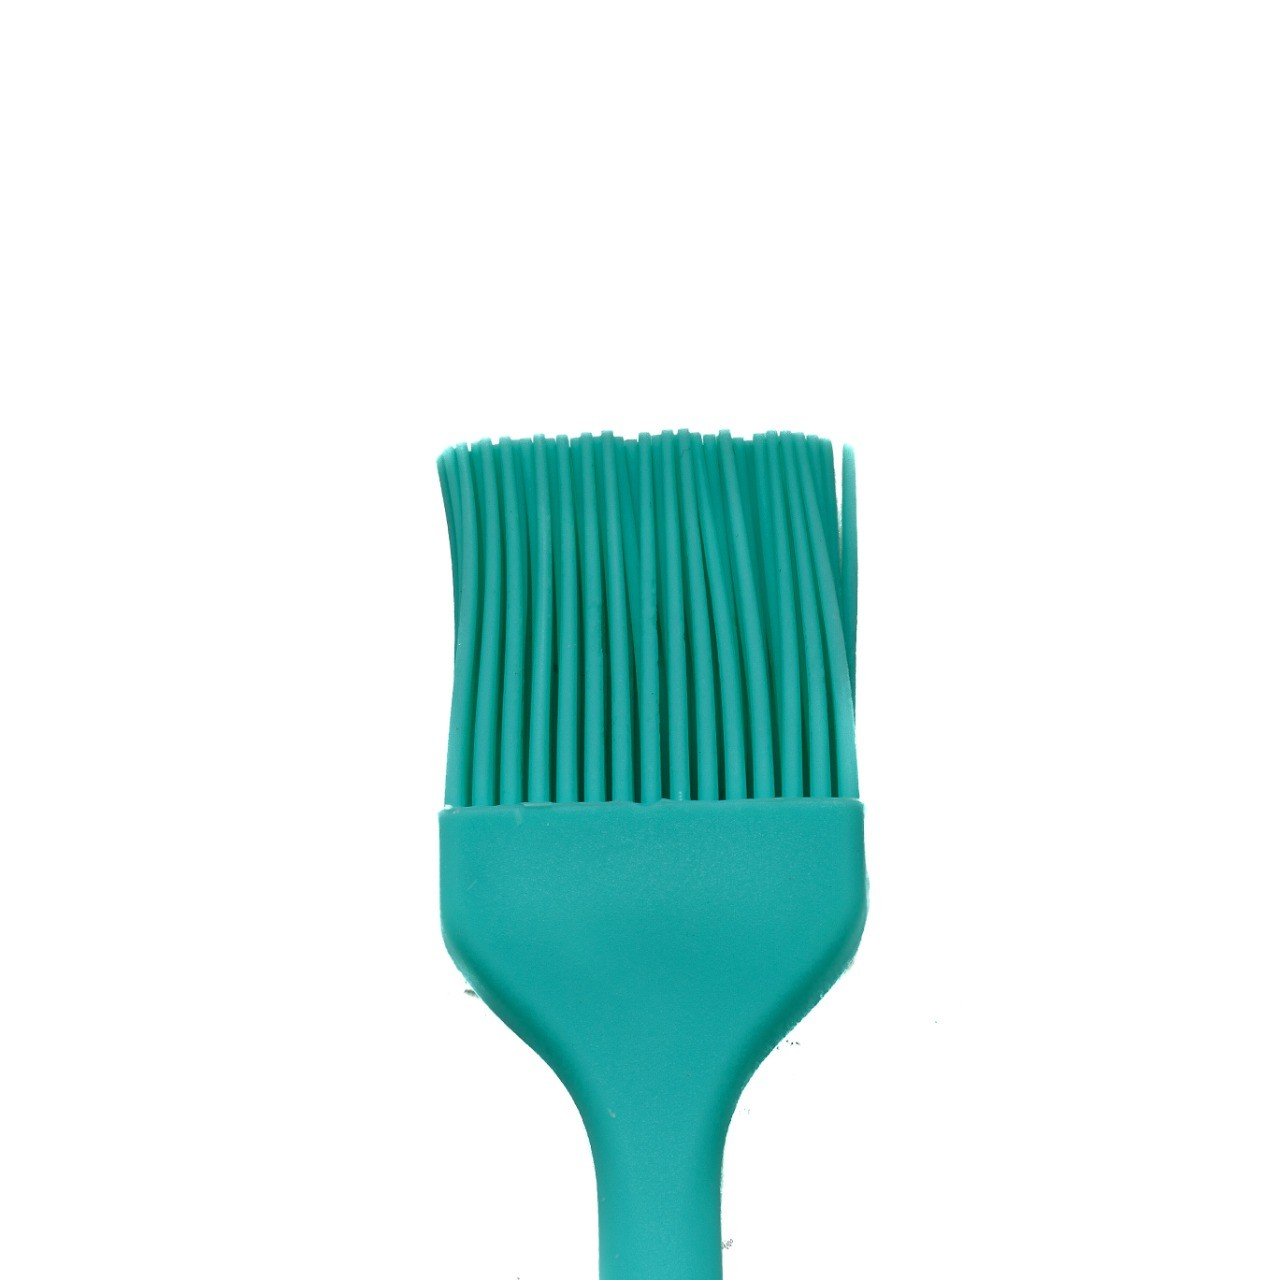 Pincel Cozinha Silicone Verde Pincelar Carne Massas Untar Forma  -  Mothelucci Loja online